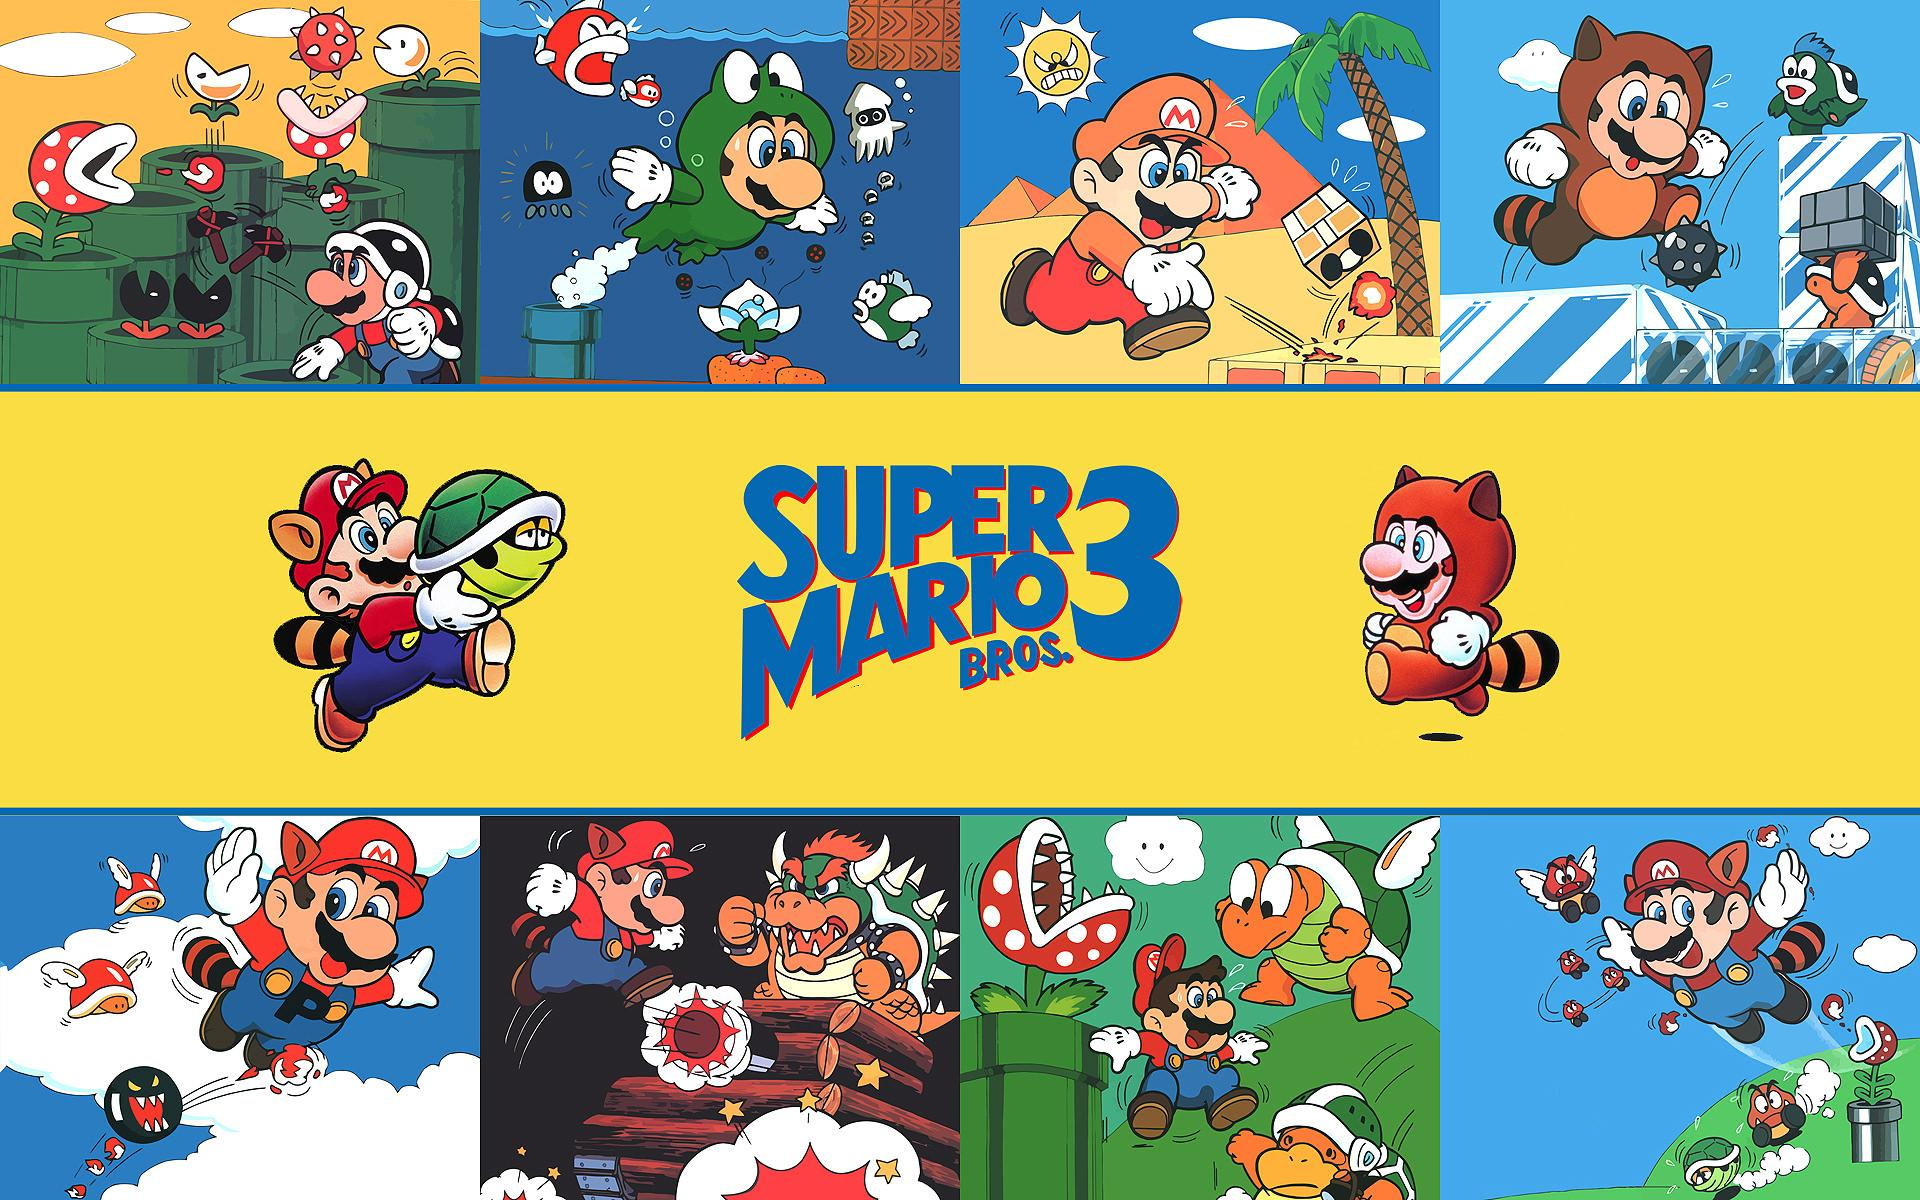 Super Mario Bros  3 Wallpapers - Wallpaper Cave